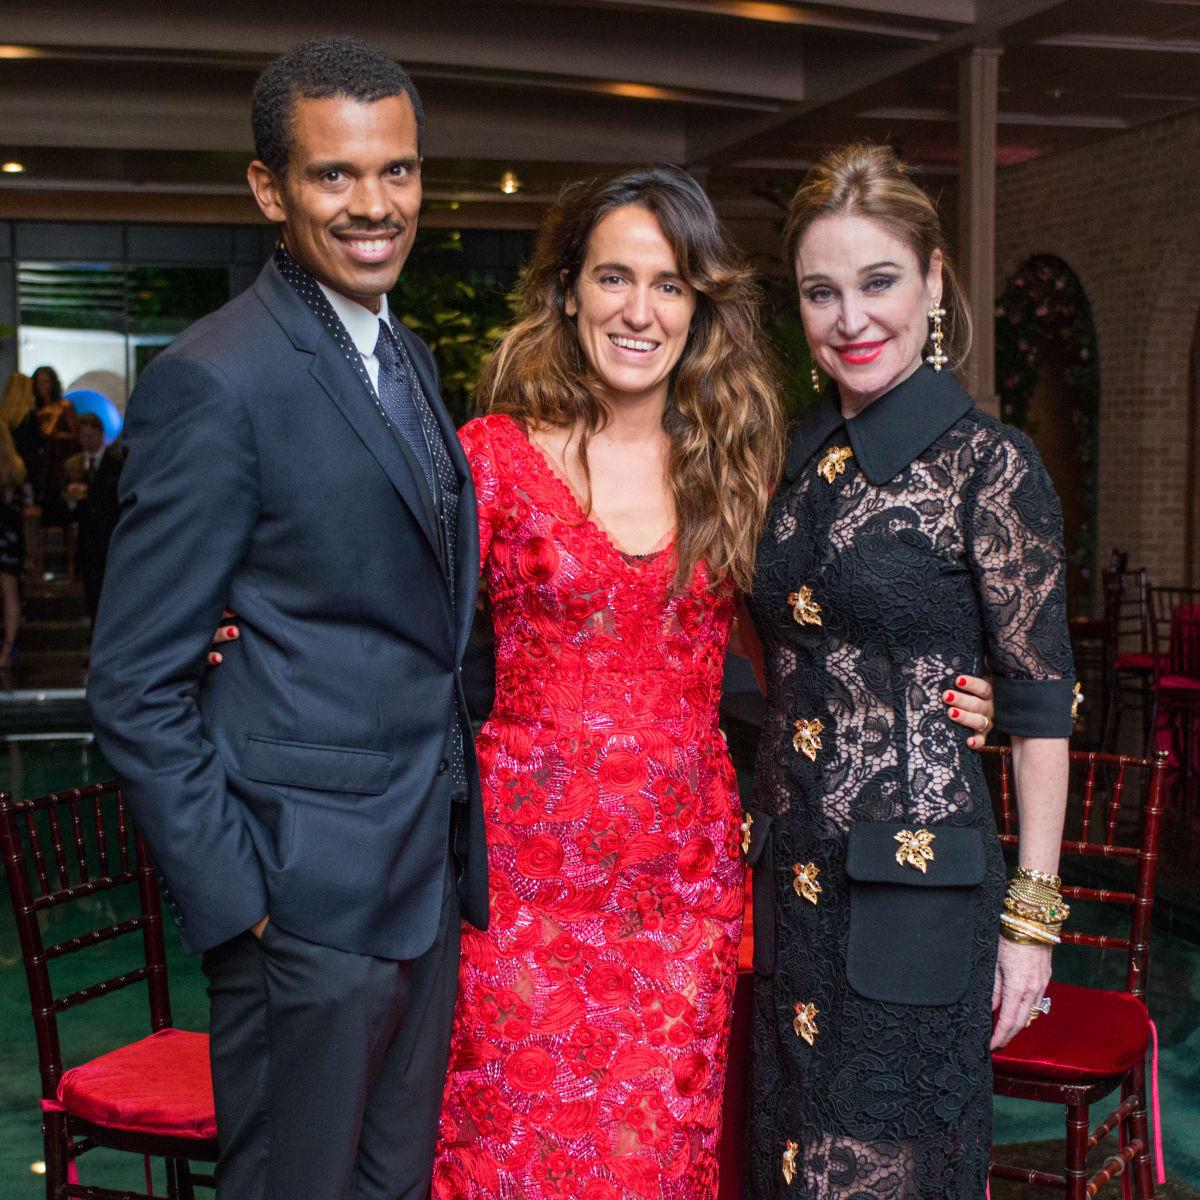 News, Shelby, Dolce & Gabbana dinner, Nov. 2015, NTK, Coco Brandolini, Becca Cason Thrash